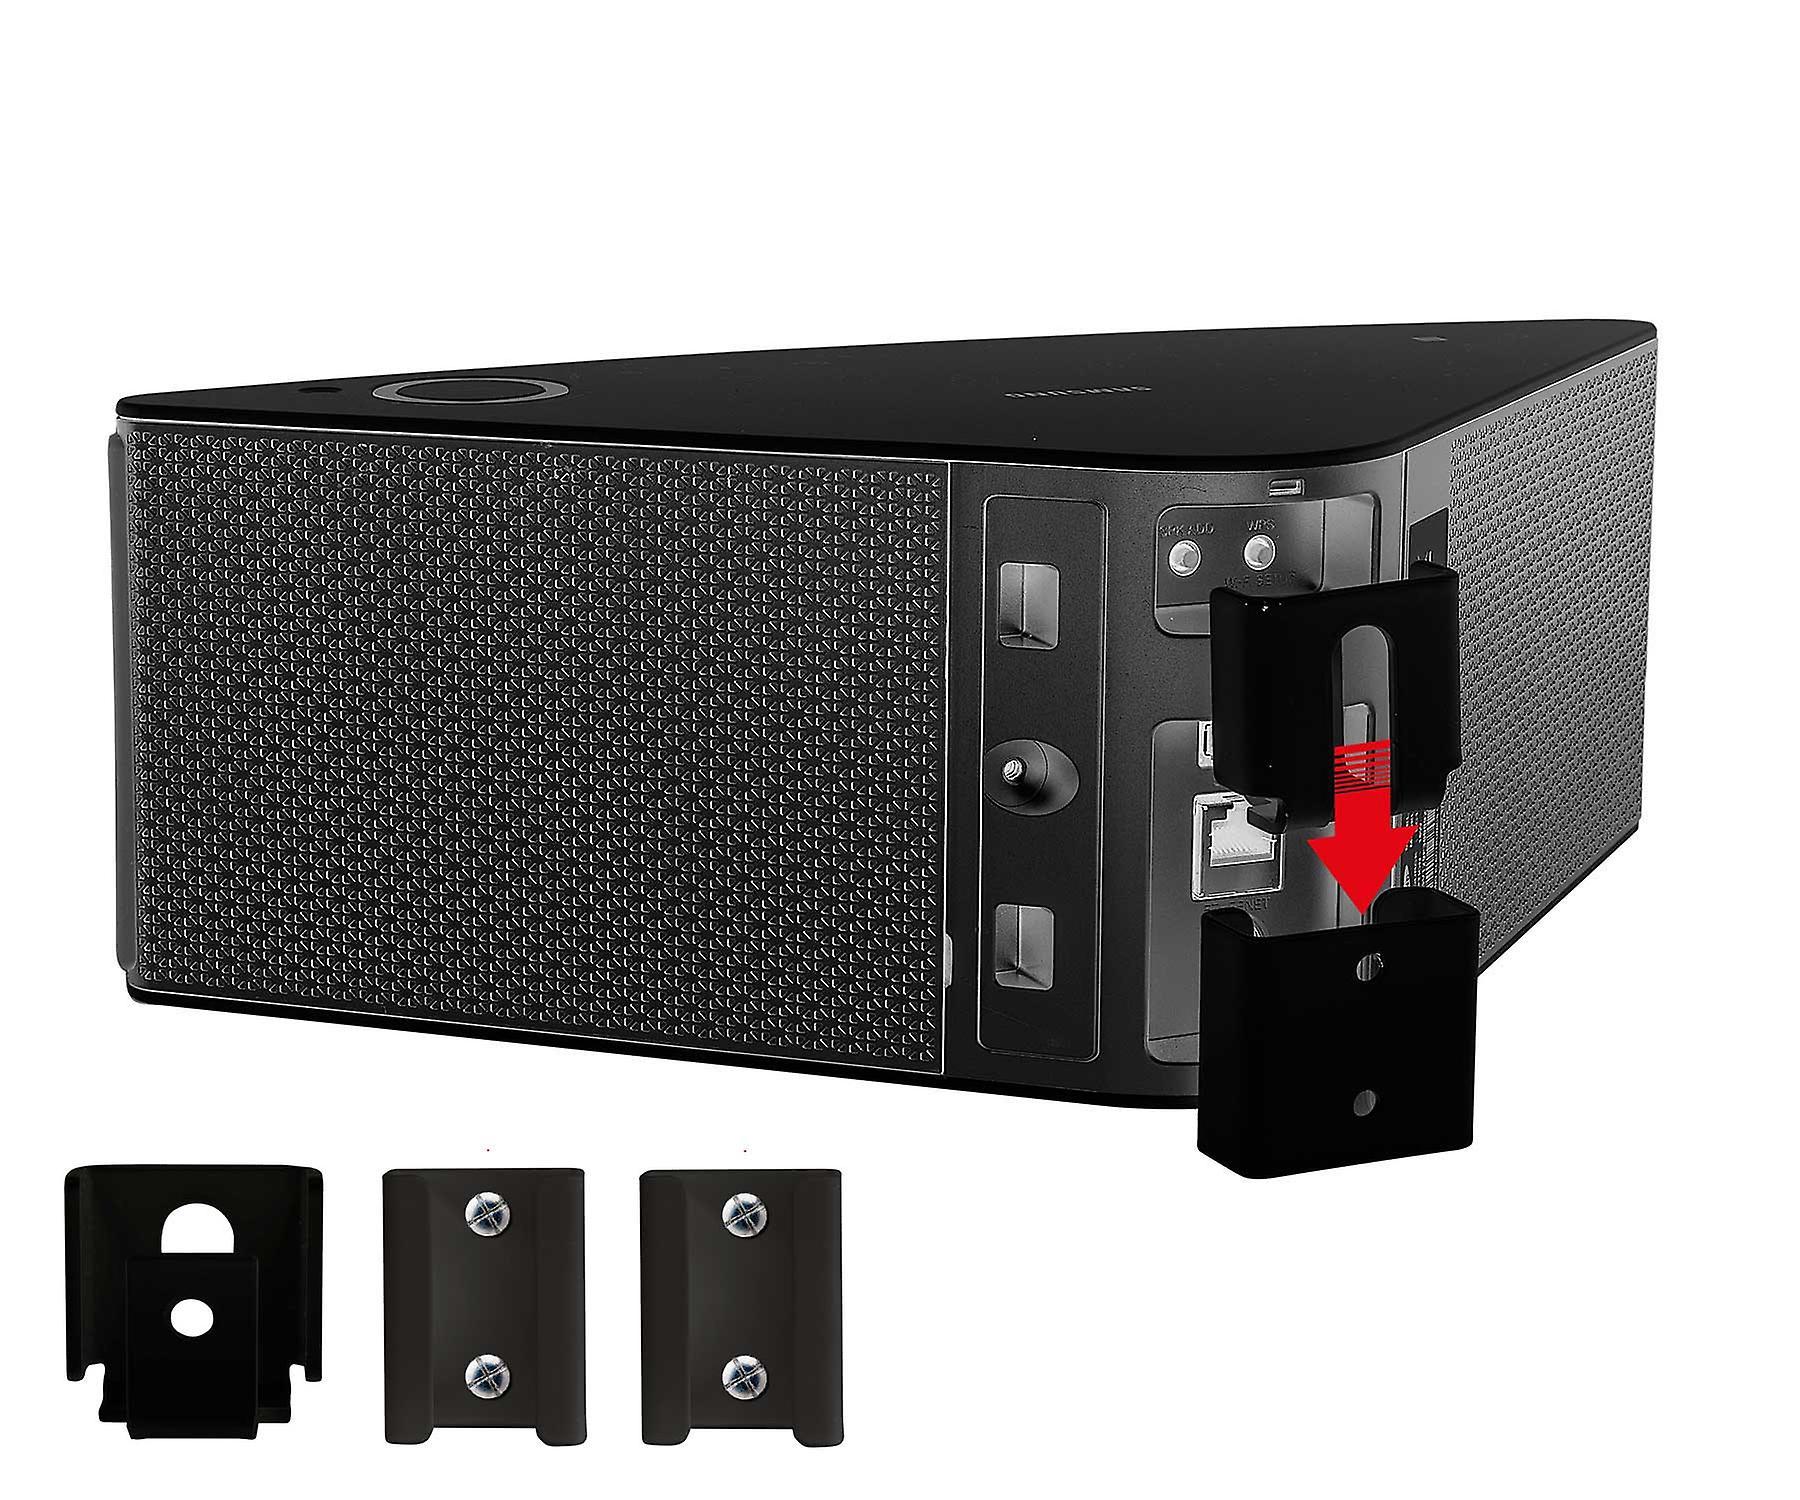 Vebos portable wall mount Samsung M3 WAM350 black